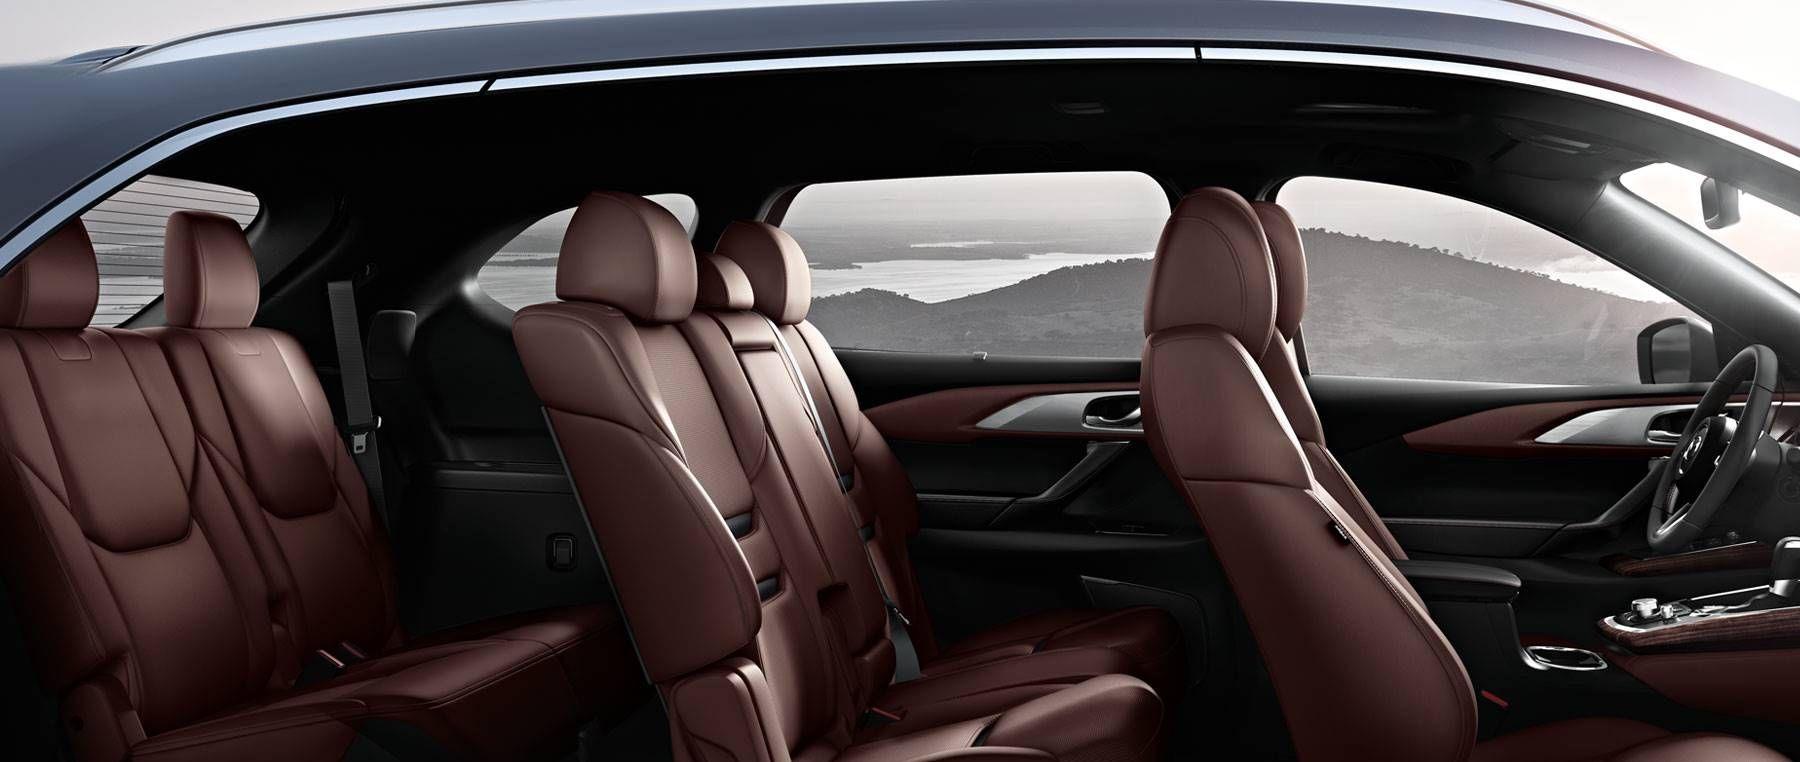 2019 Mazda CX-9 Full Interior